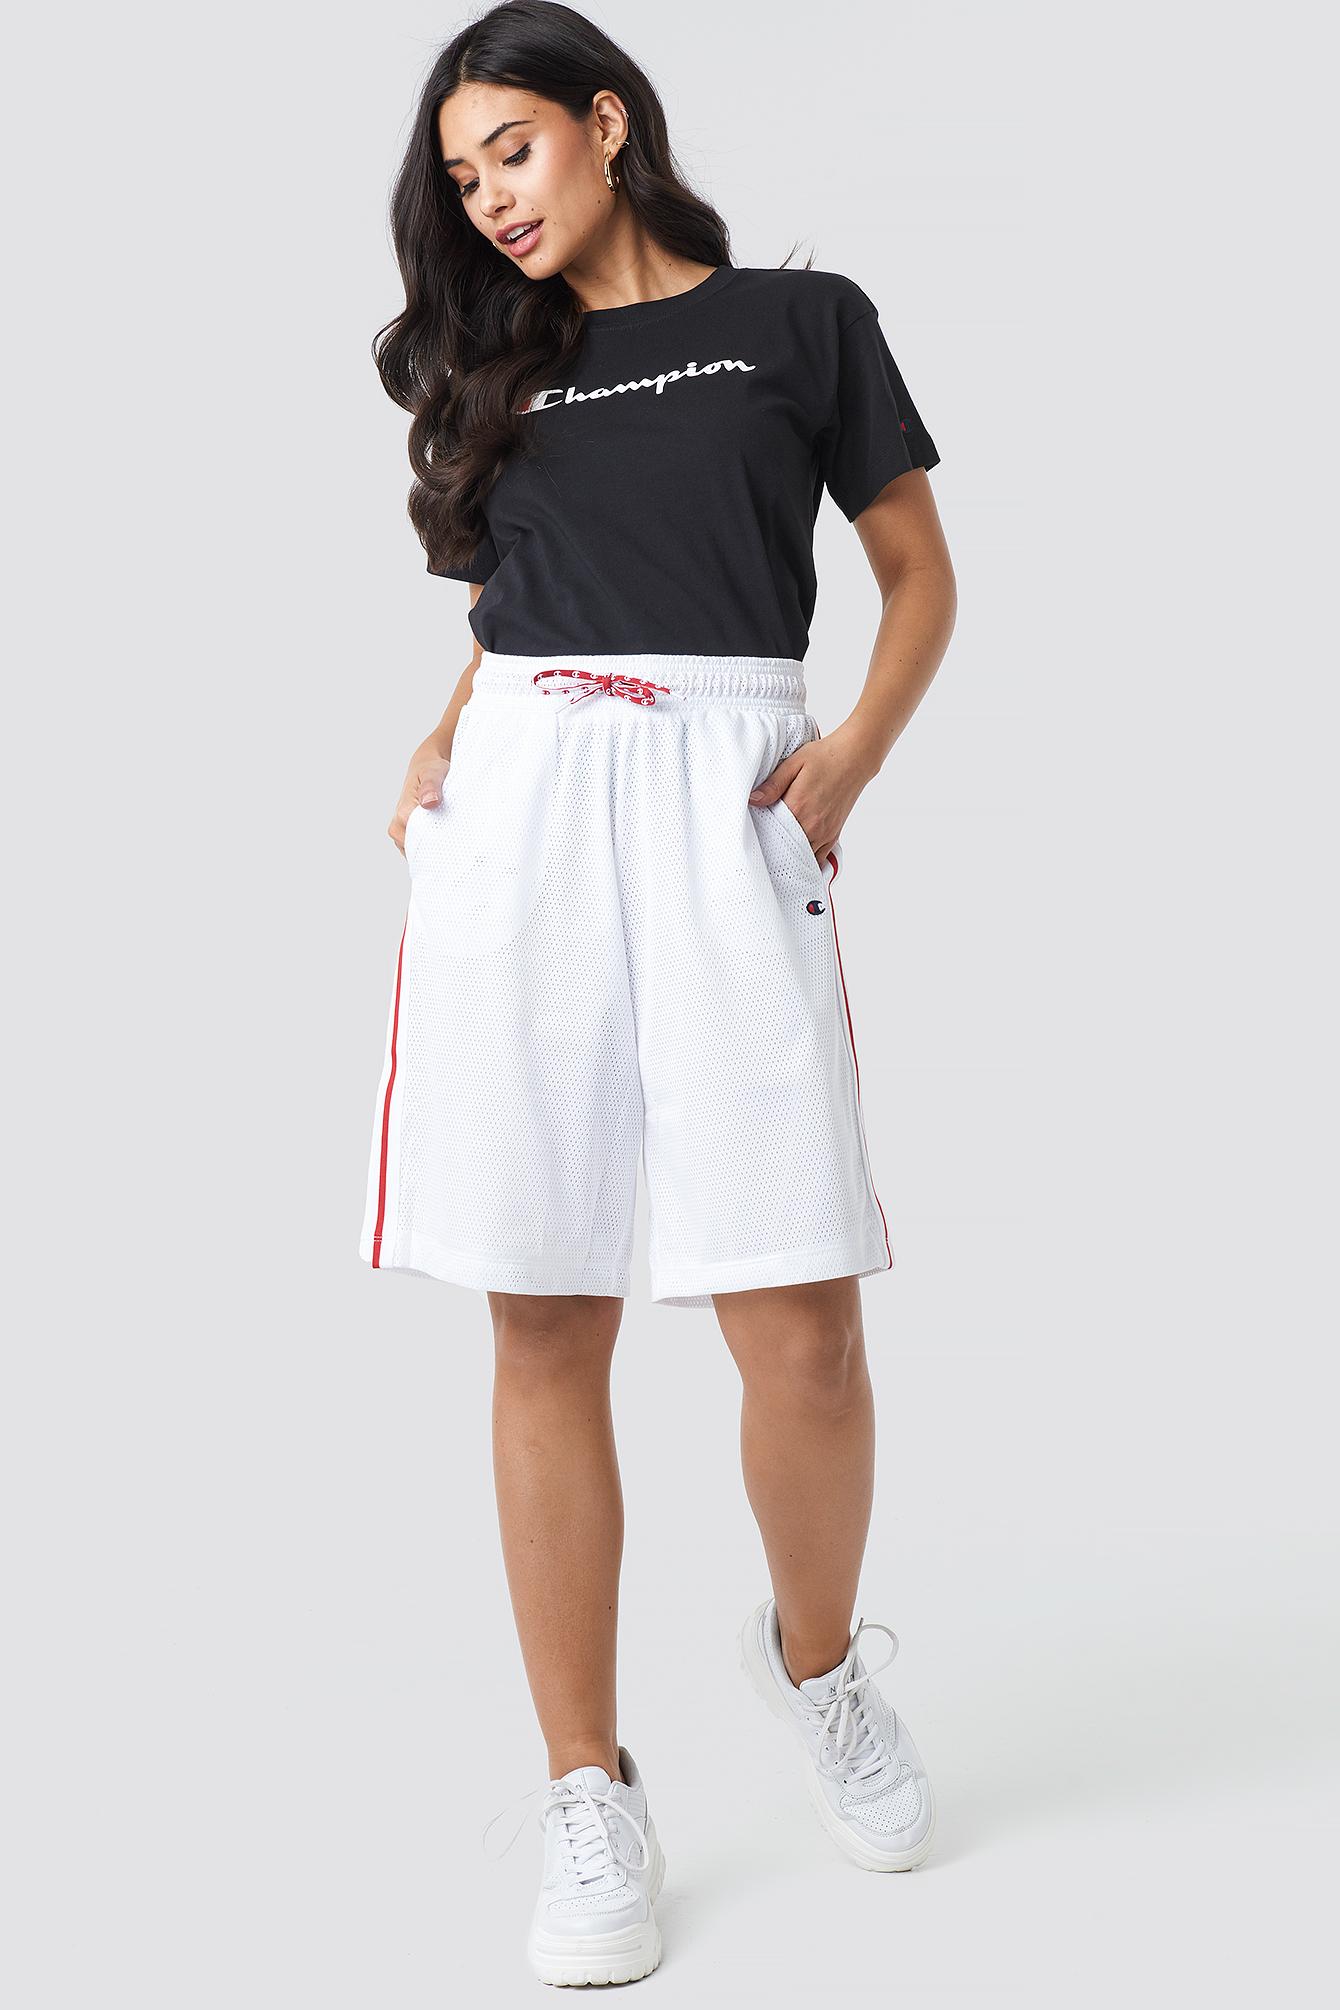 Champion Shorts 3/4 BERMUDA SHORTS - WHITE